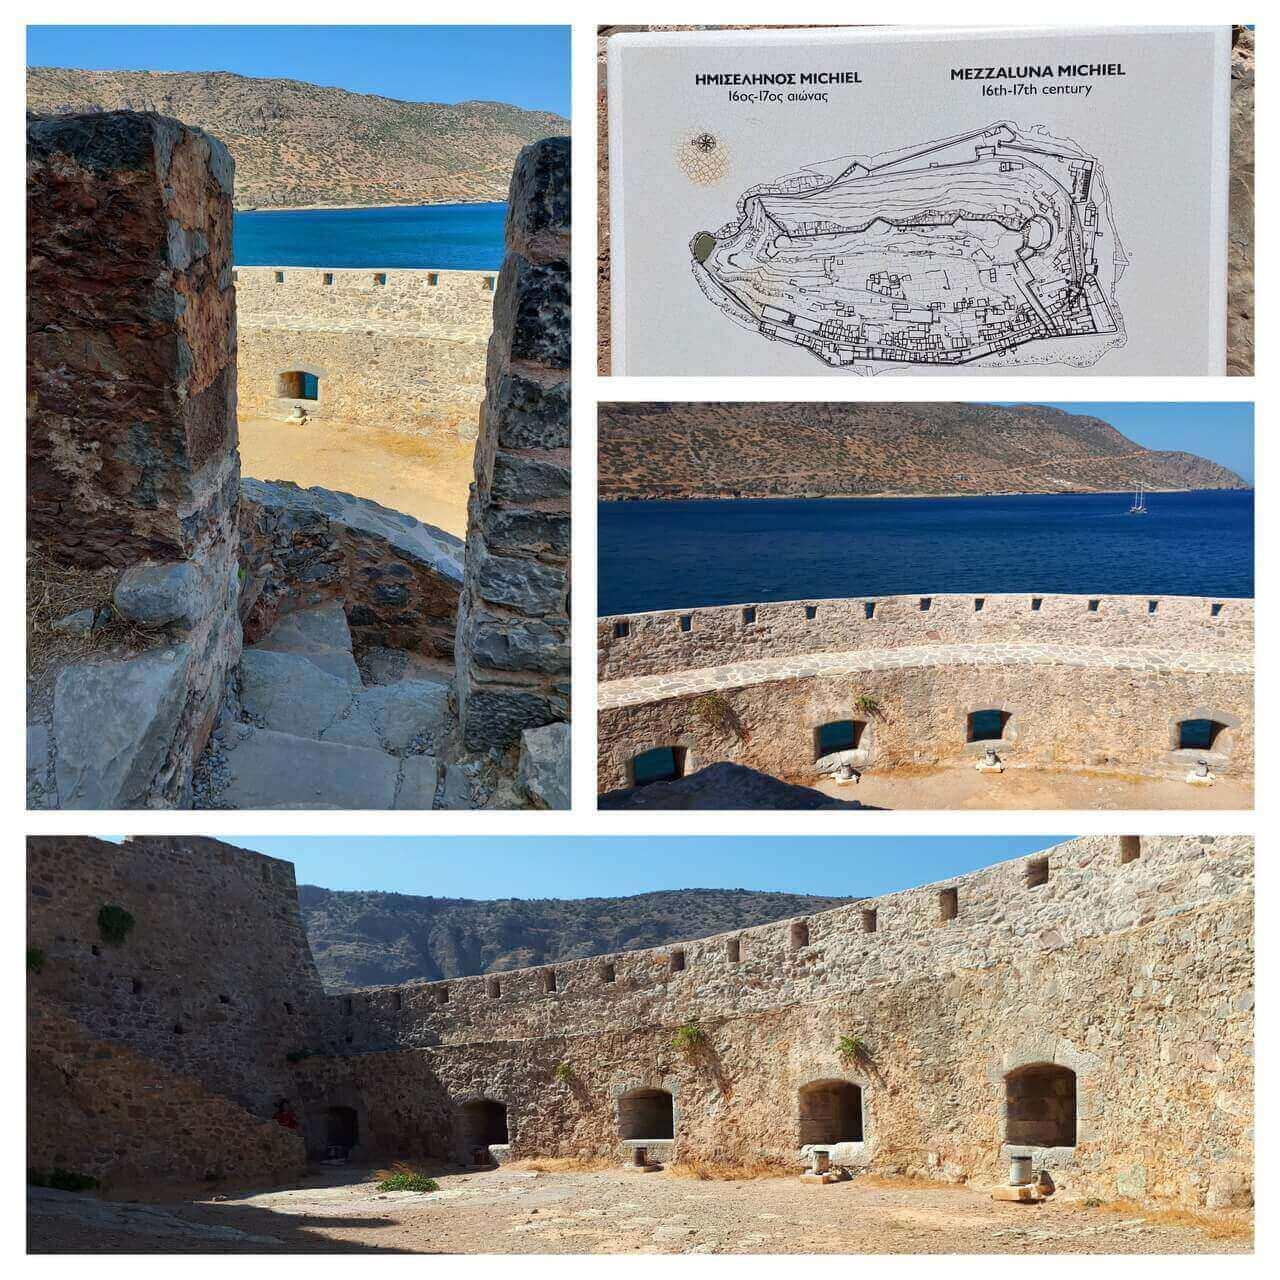 Spinalonga, Mezzaluna Micheilis bastion